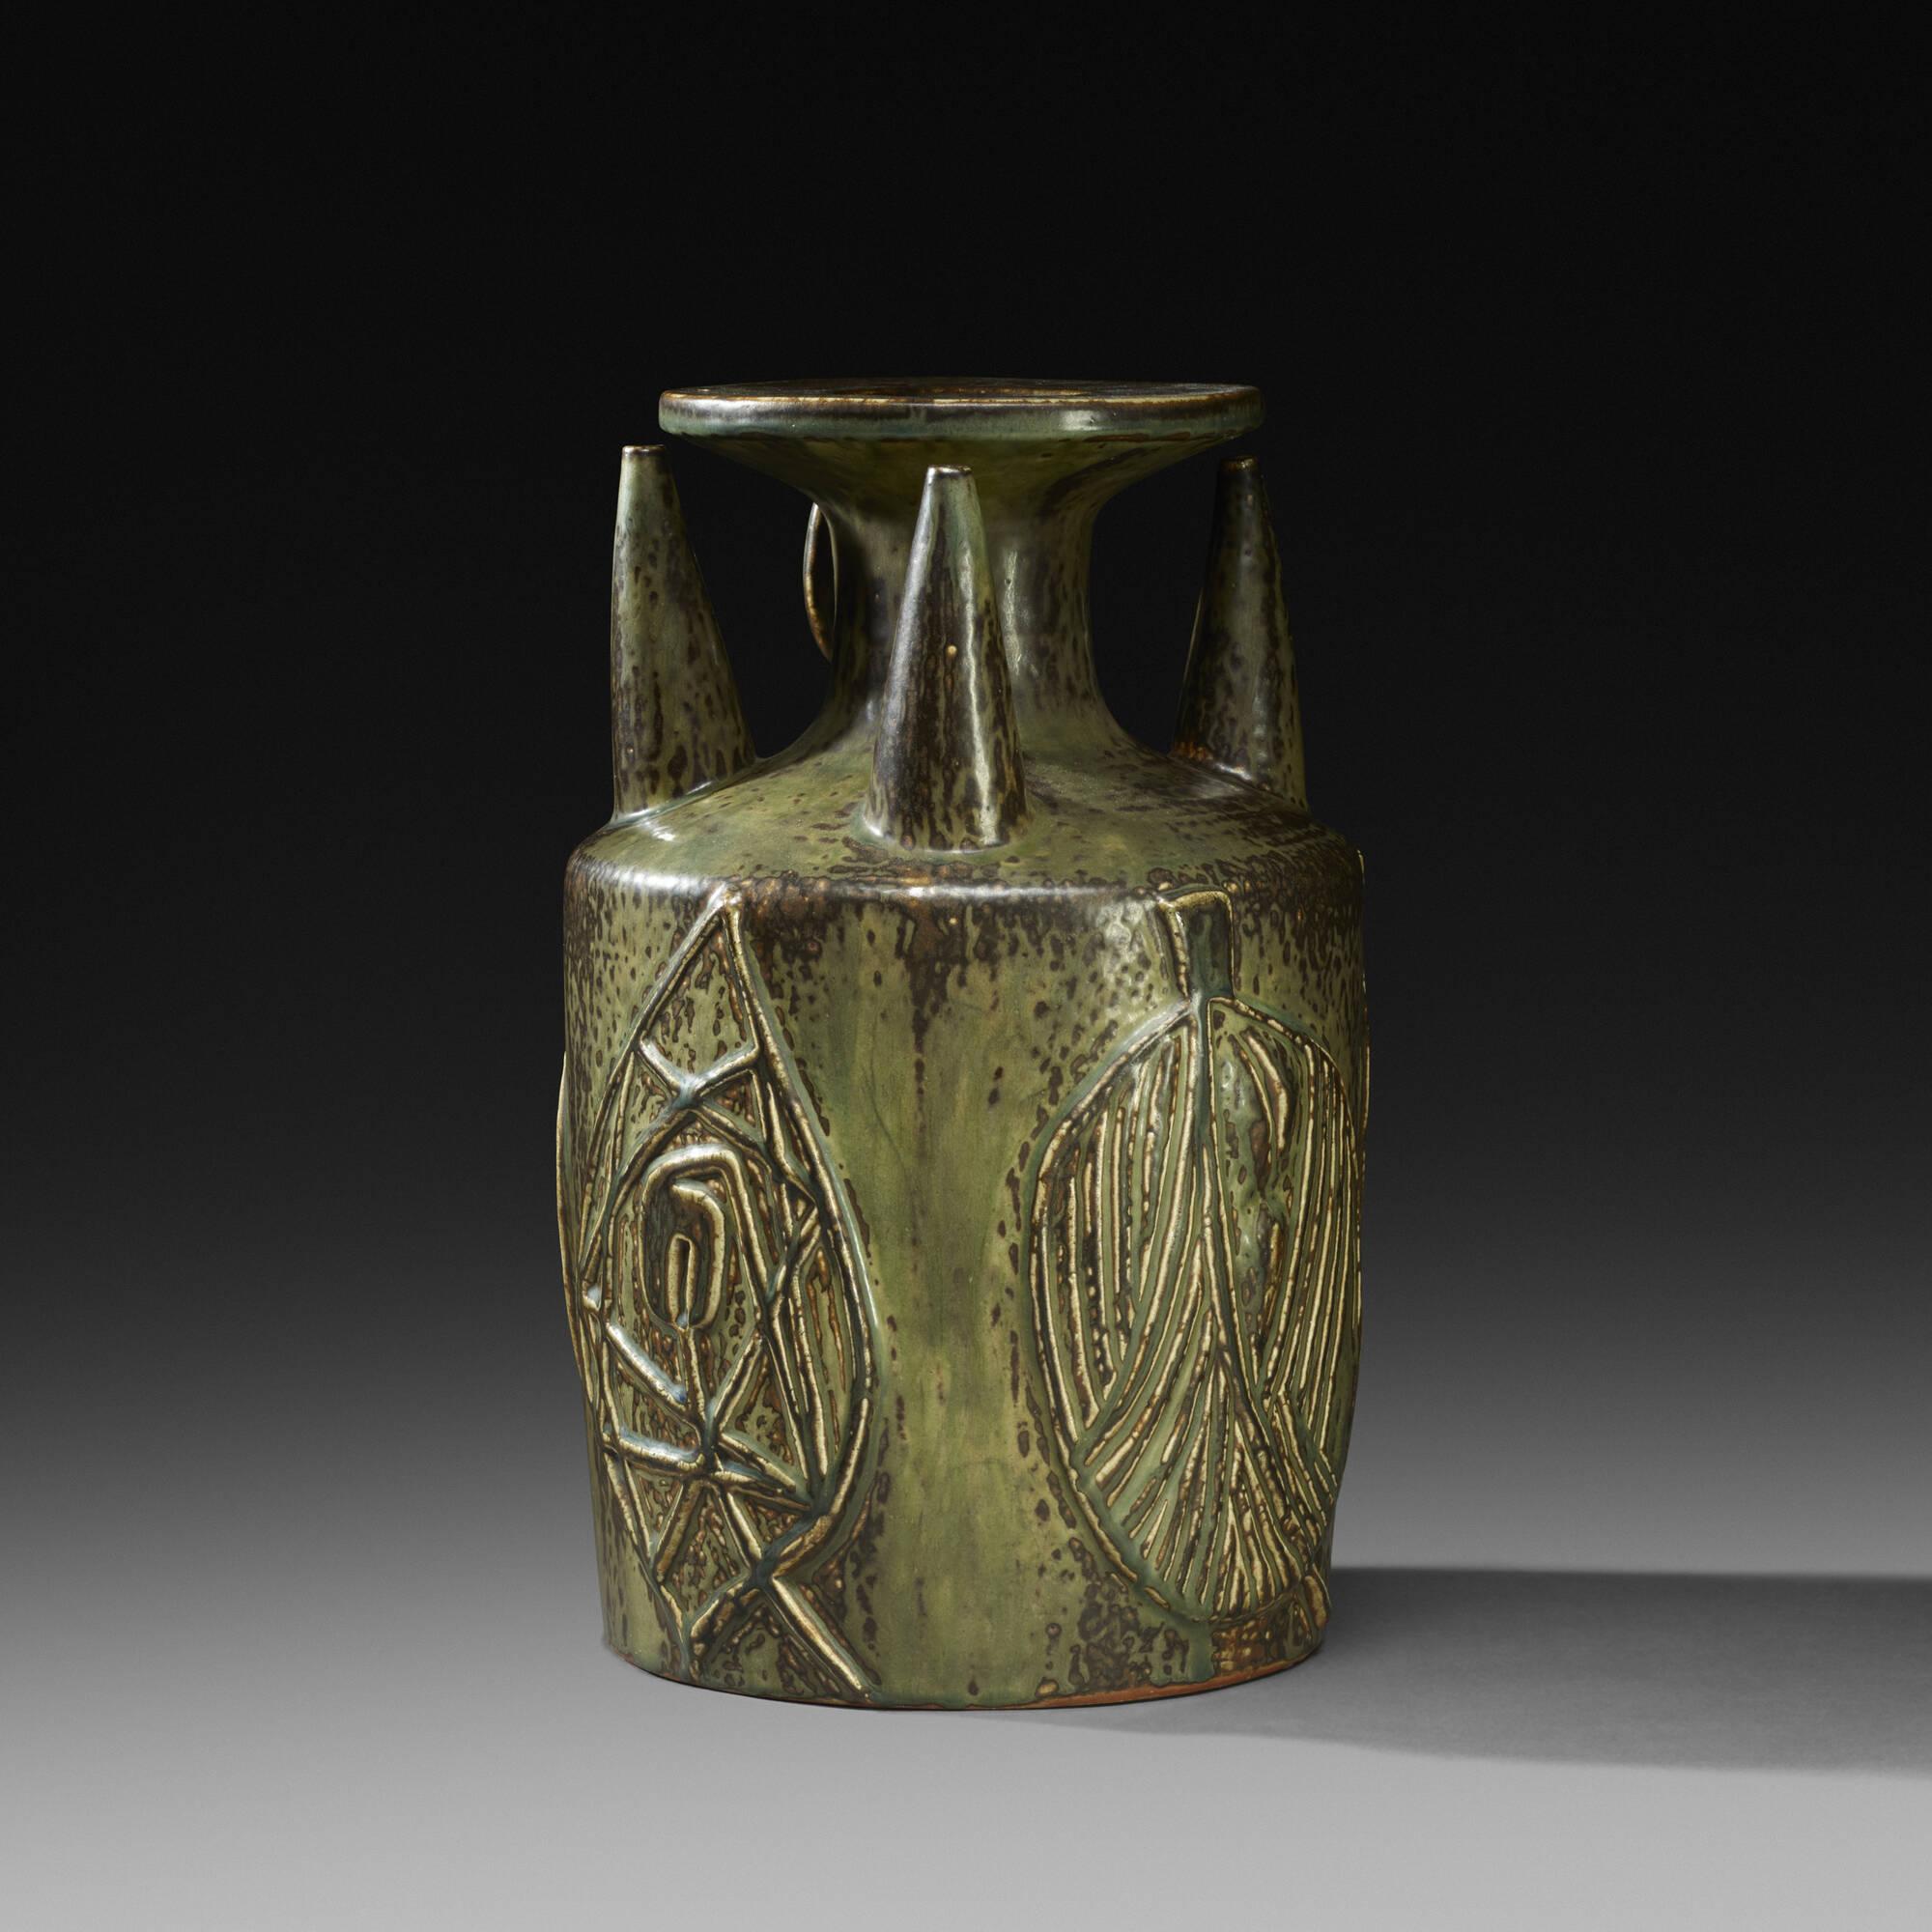 146: Axel Salto / Living Stone vase (2 of 3)